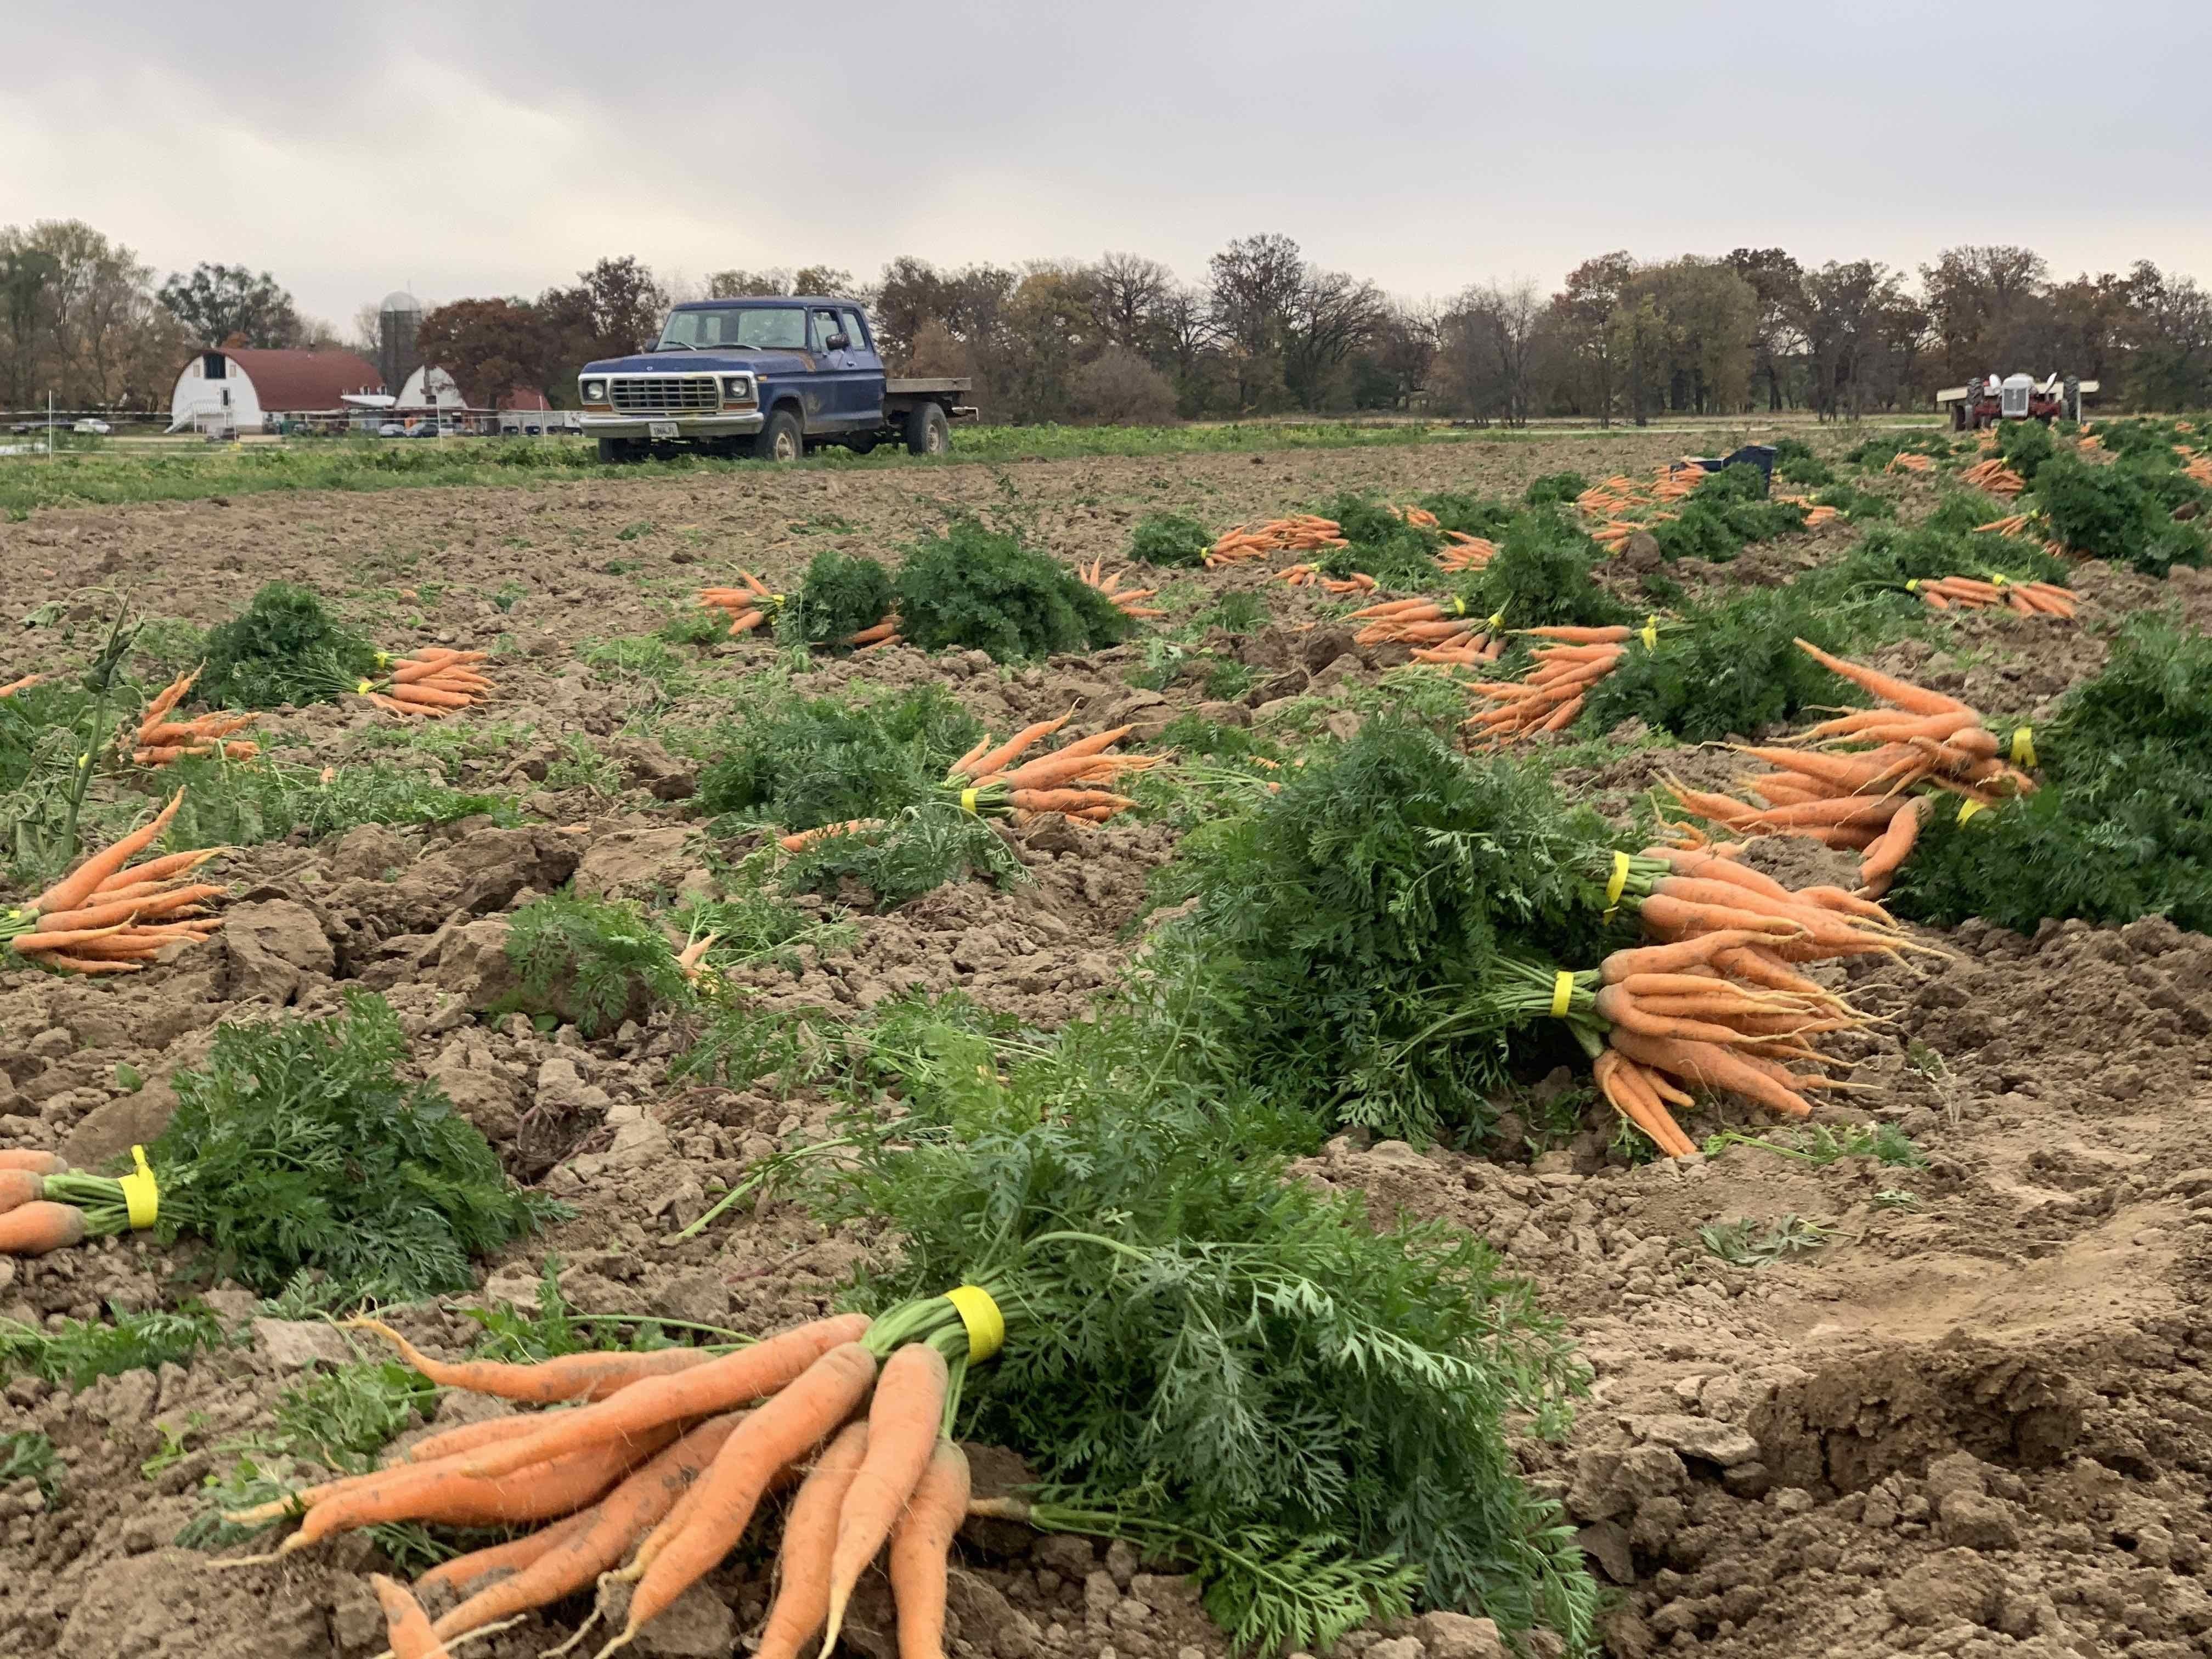 Next Happening: Week 19 Farm News Coming Soon